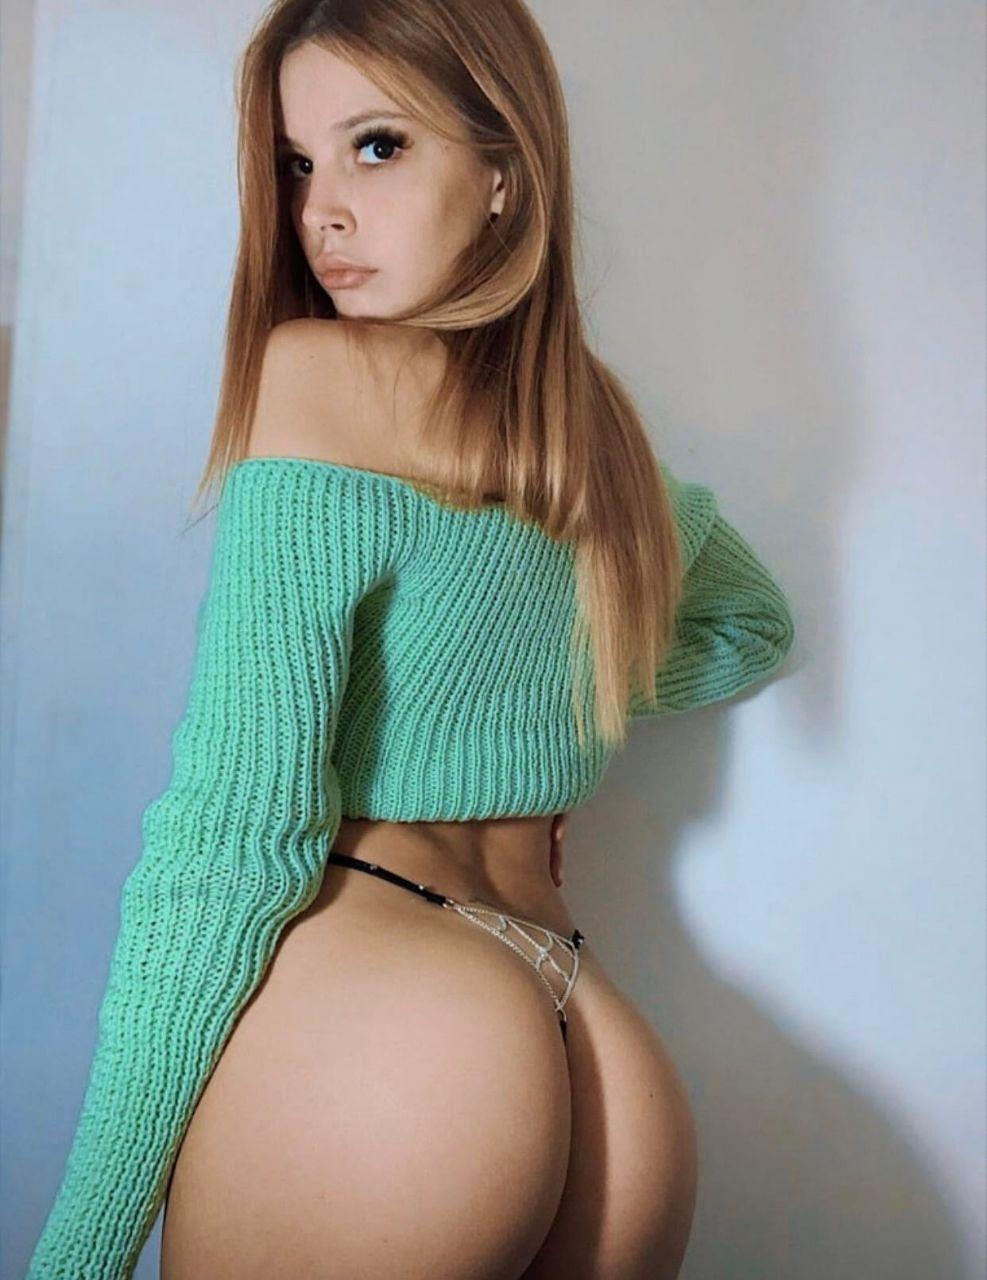 Skinny amateur babe @yuslopez hot selfies